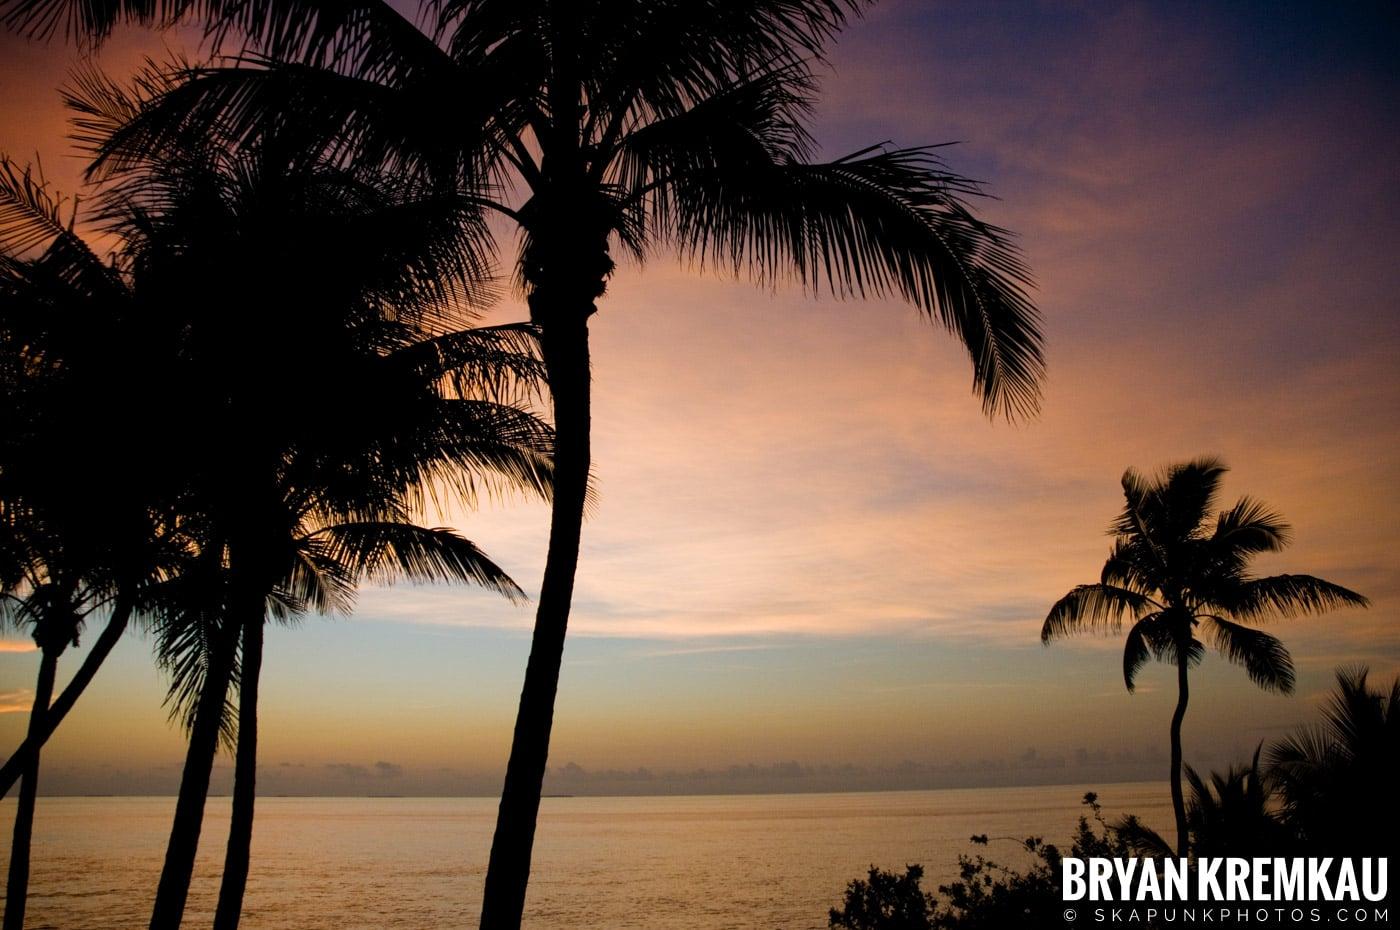 Florida Keys Vacation - 7.09.10 - 7.15.10 (68)